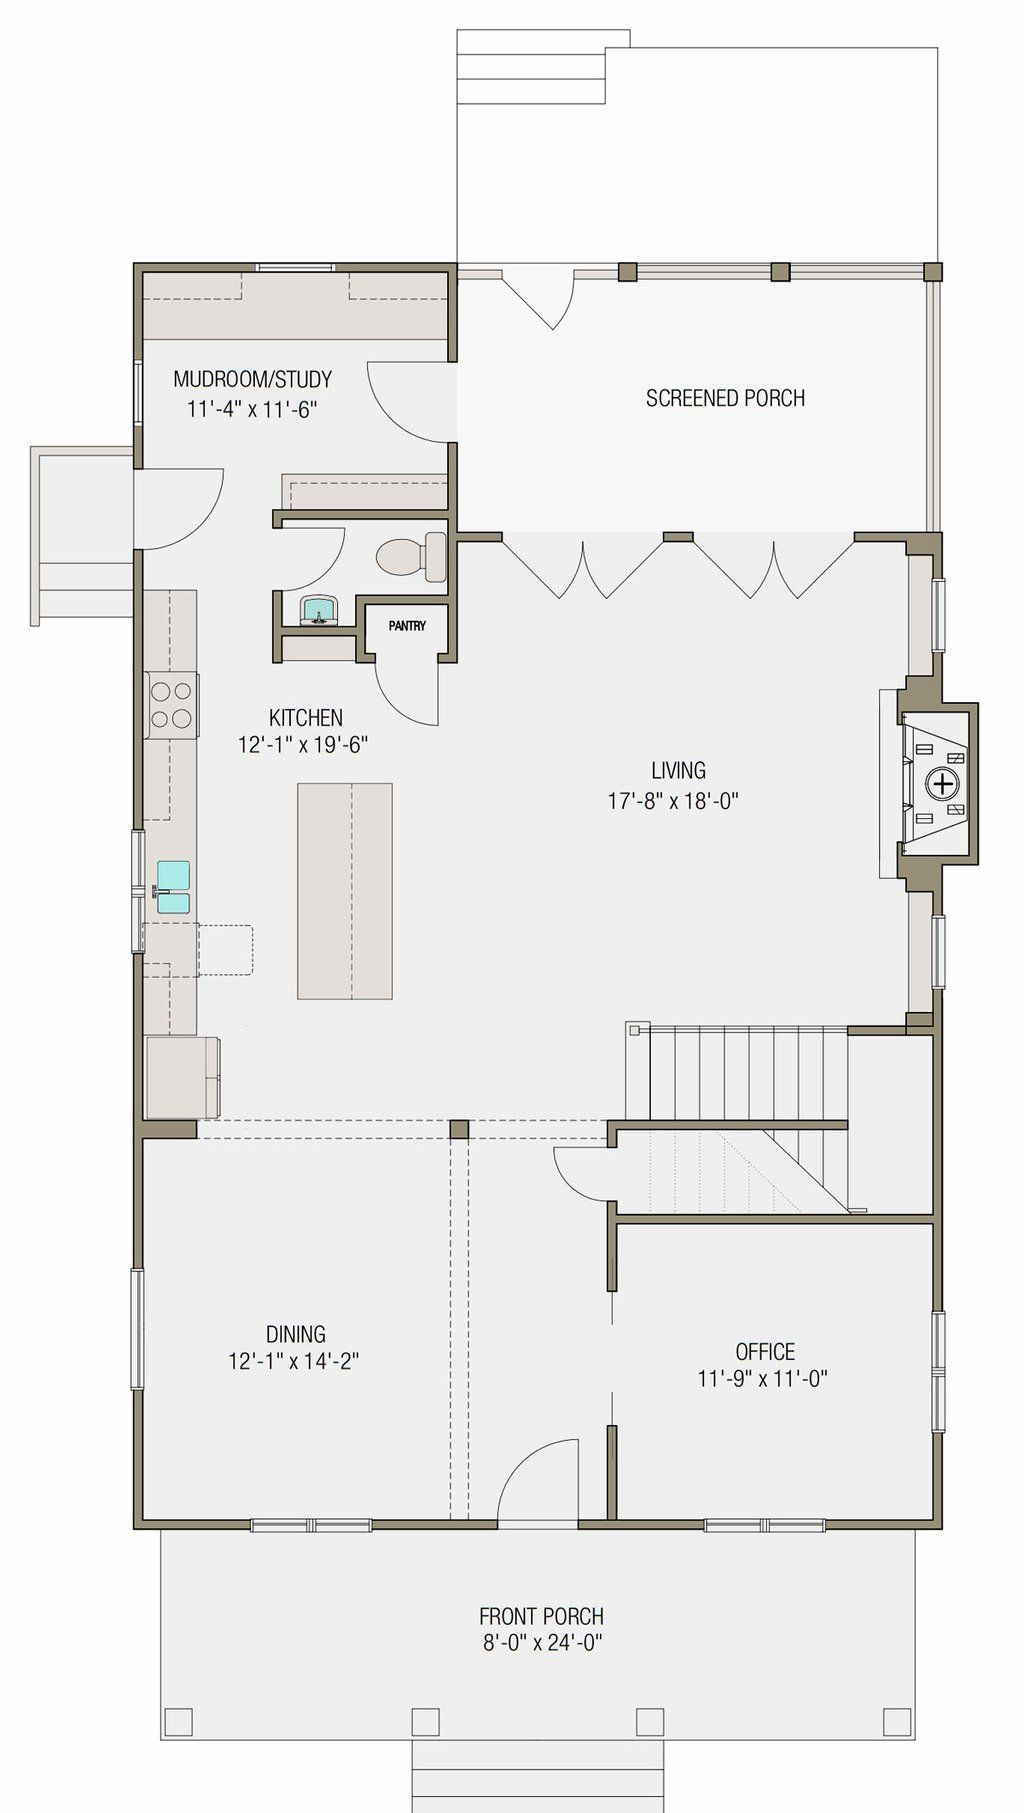 18 X 24 House Plans Beautiful Prairie Style House Plan 4 Beds 2 5 Baths 2460 Sq Ft Plan 461 49 In 2020 House Plans Prairie Style Houses Floor Plans